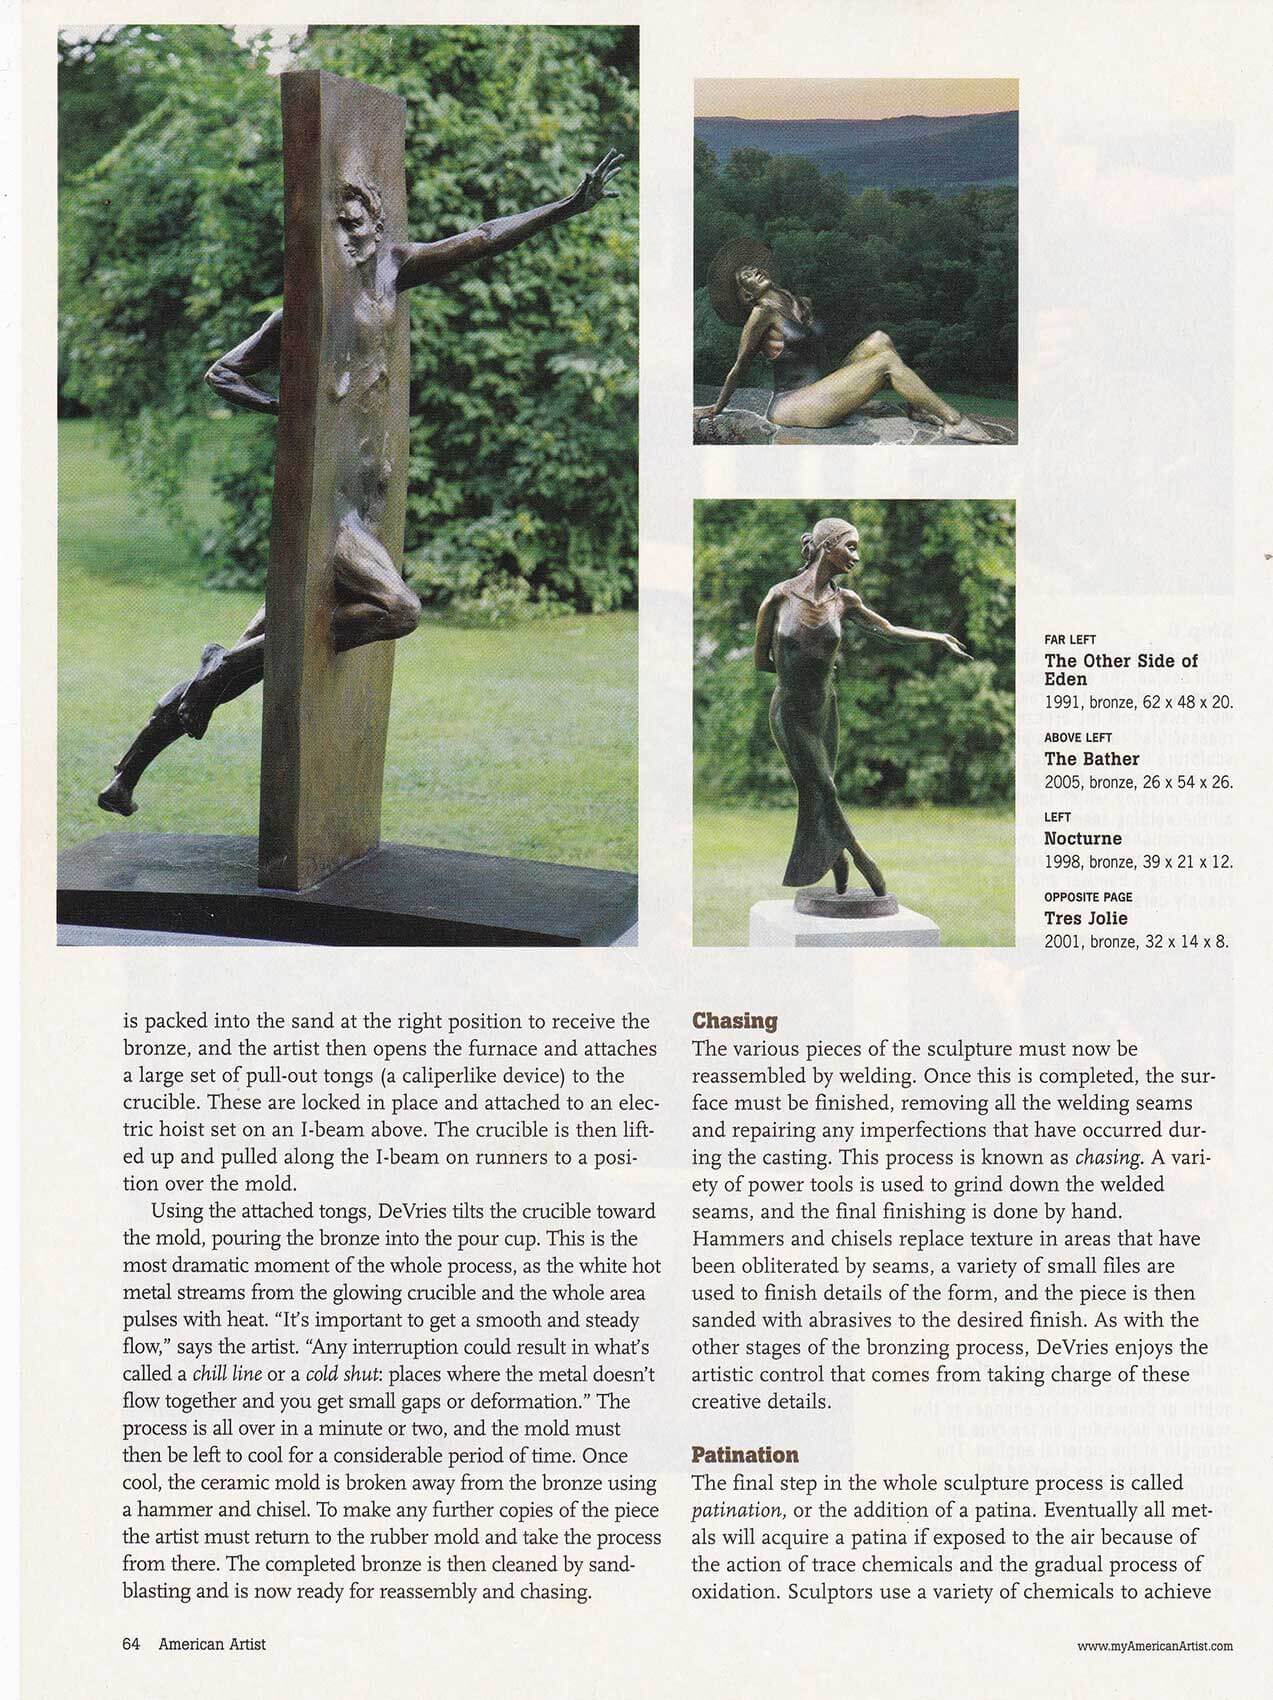 American Artist magazine December 2007page 64